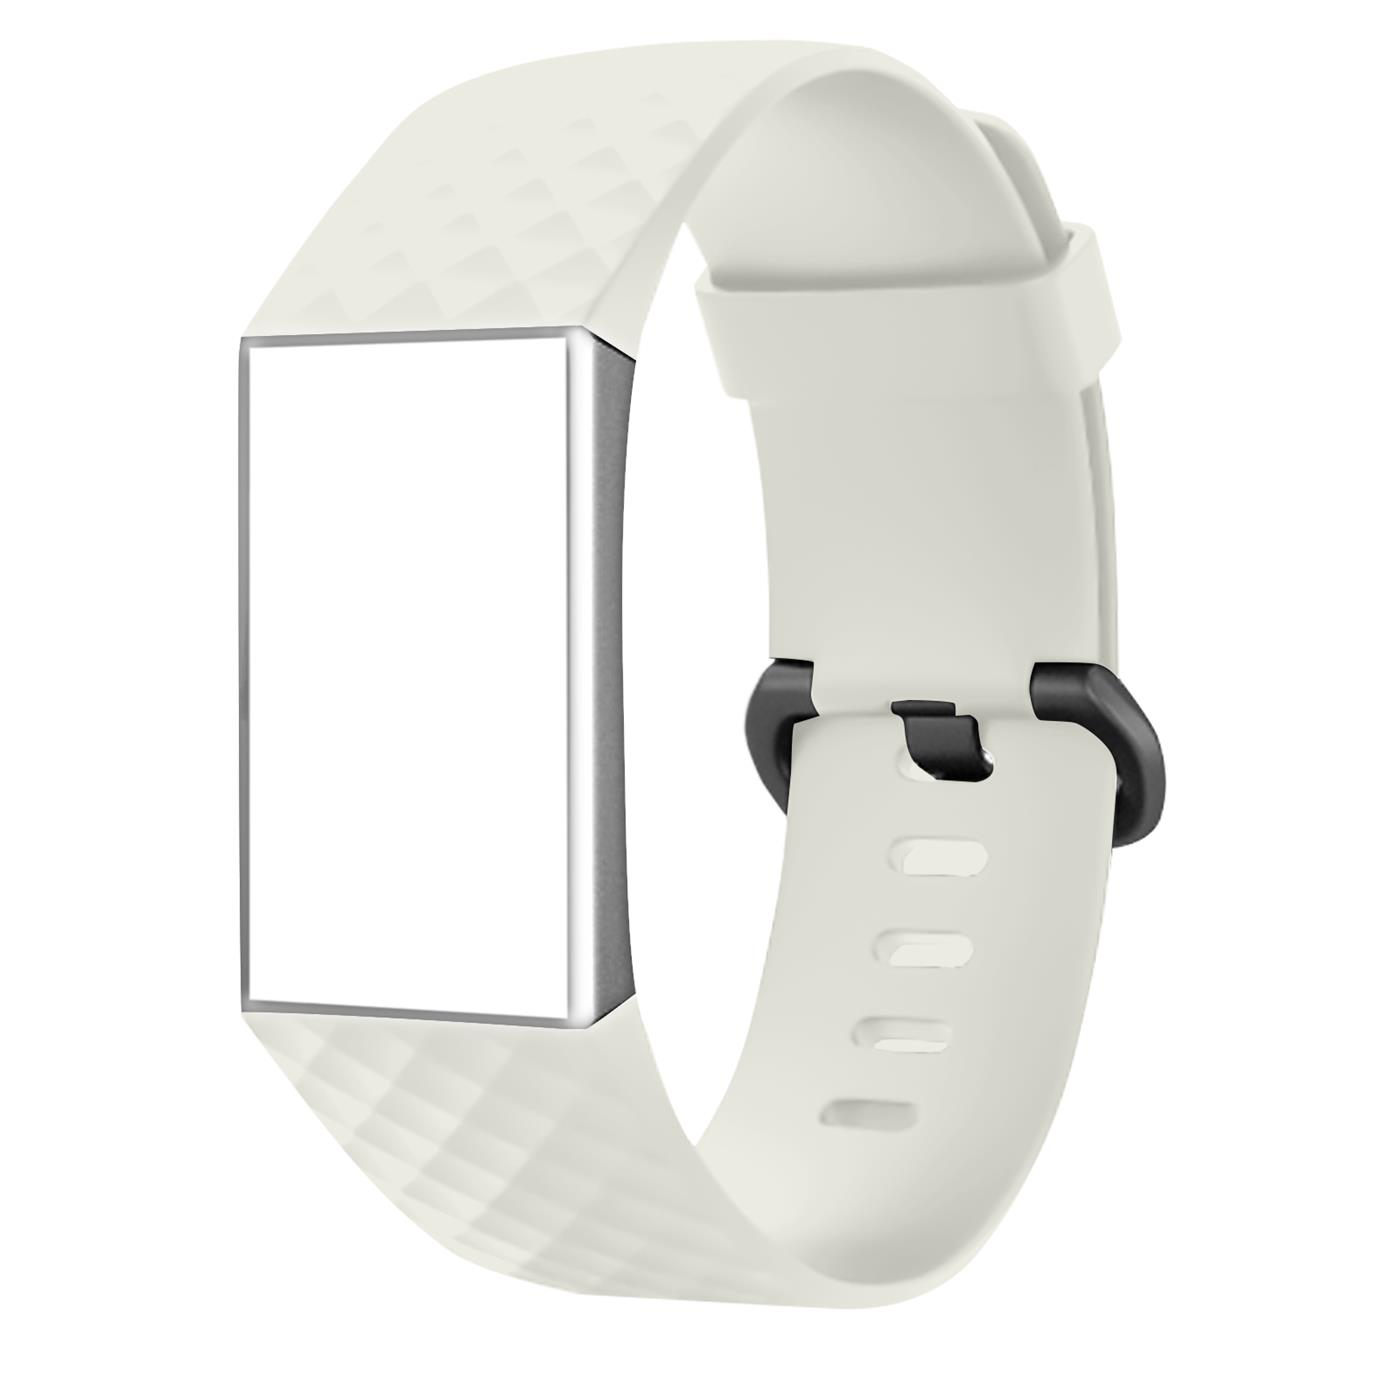 Fitbit-Groesse-S-oder-L-Ersatz-Silikon-Armband-Uhren-Sport-Band-Fitness-Tracker Indexbild 24